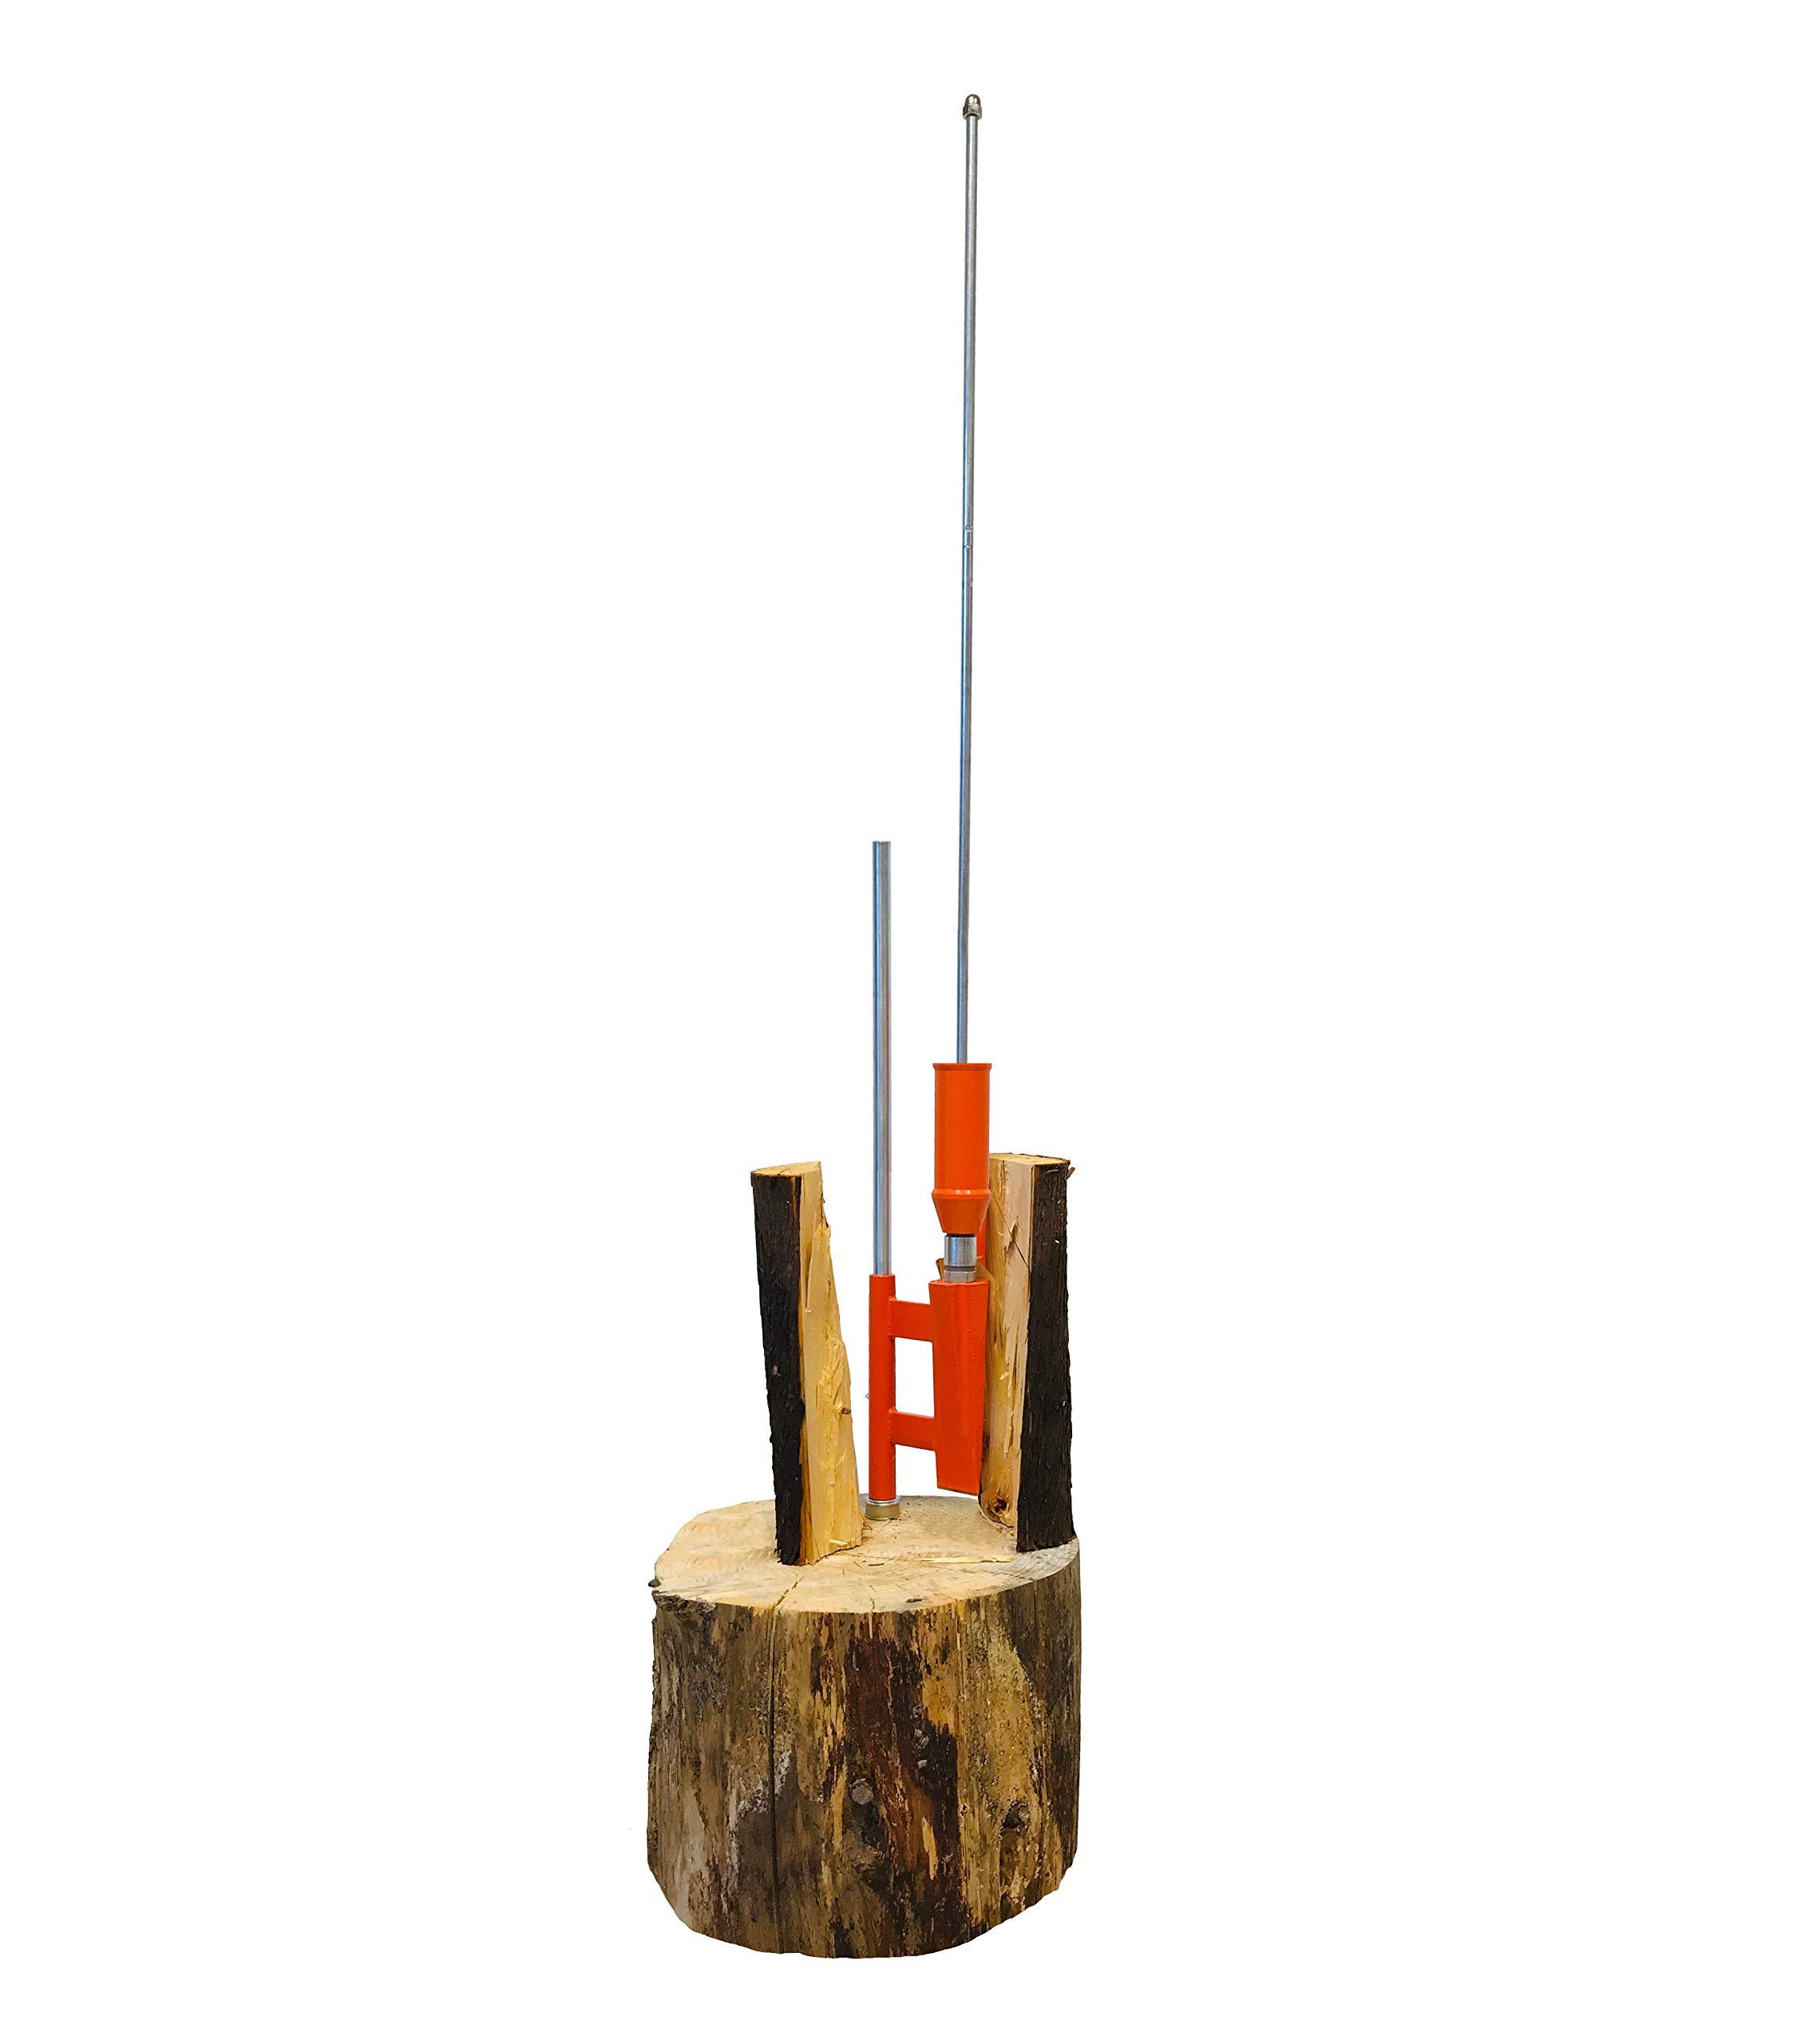 SPEED FORCE Splitter Firewood Chopping